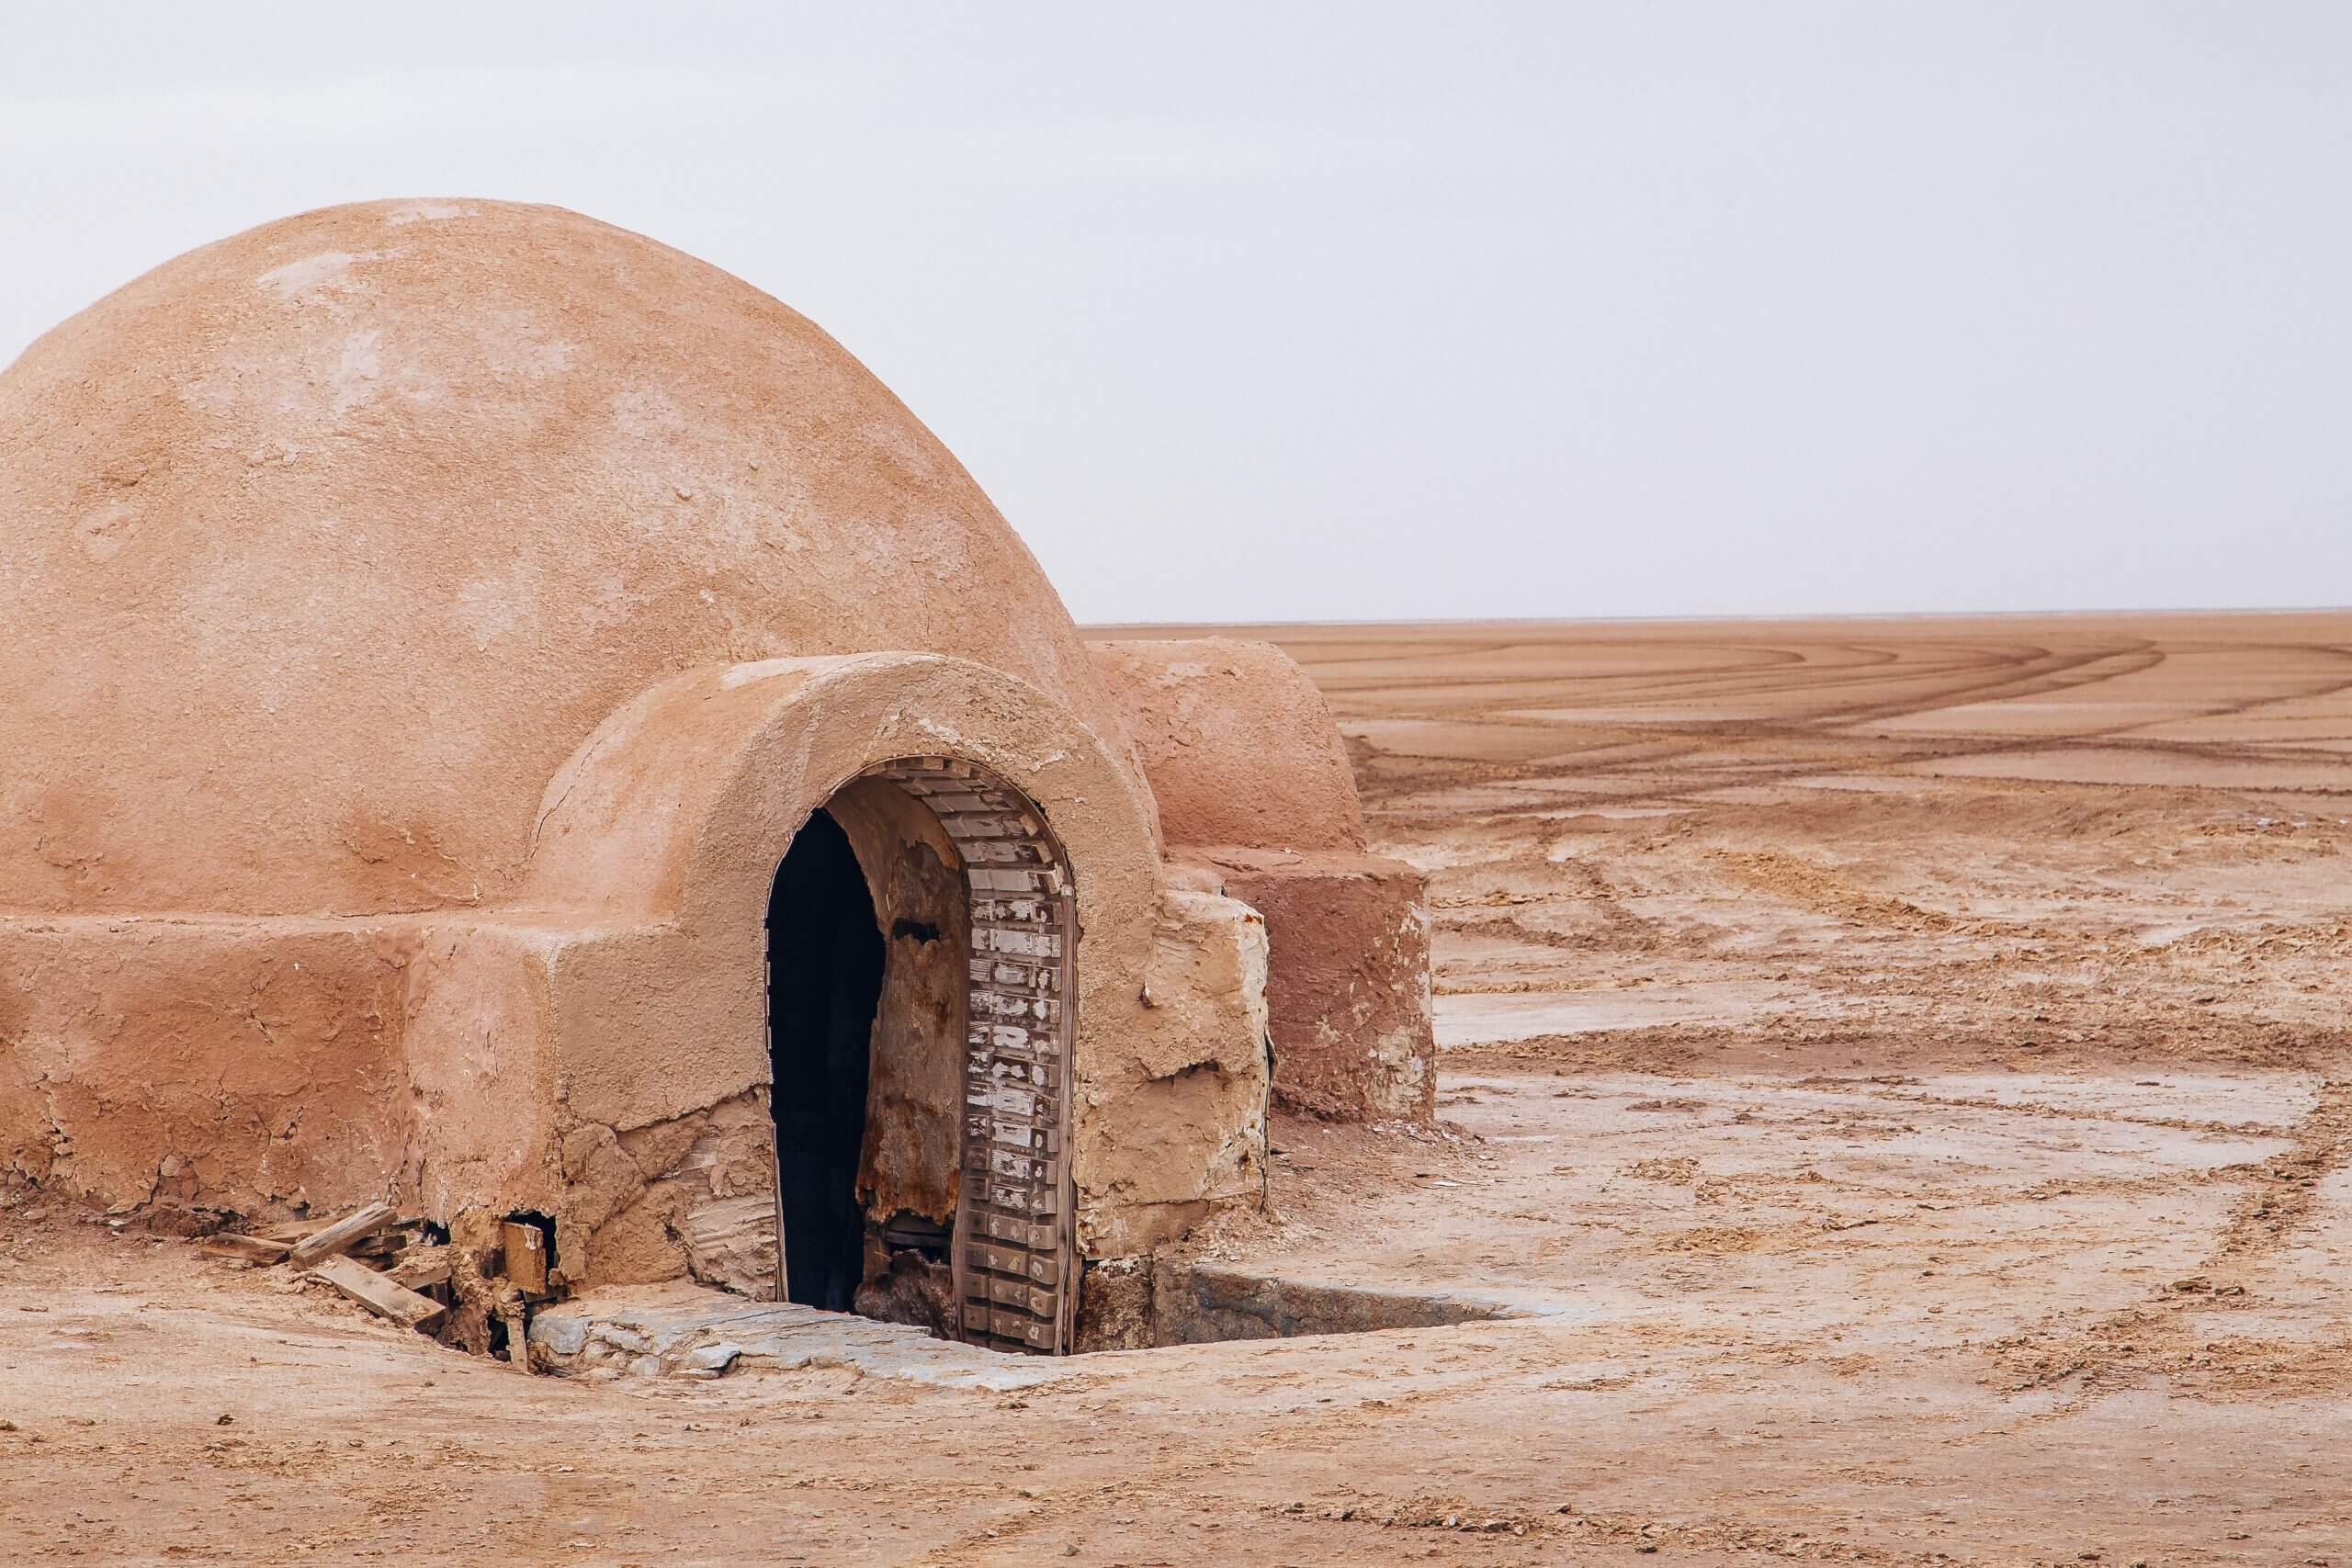 Lars-Home-star wars Obi-Wan